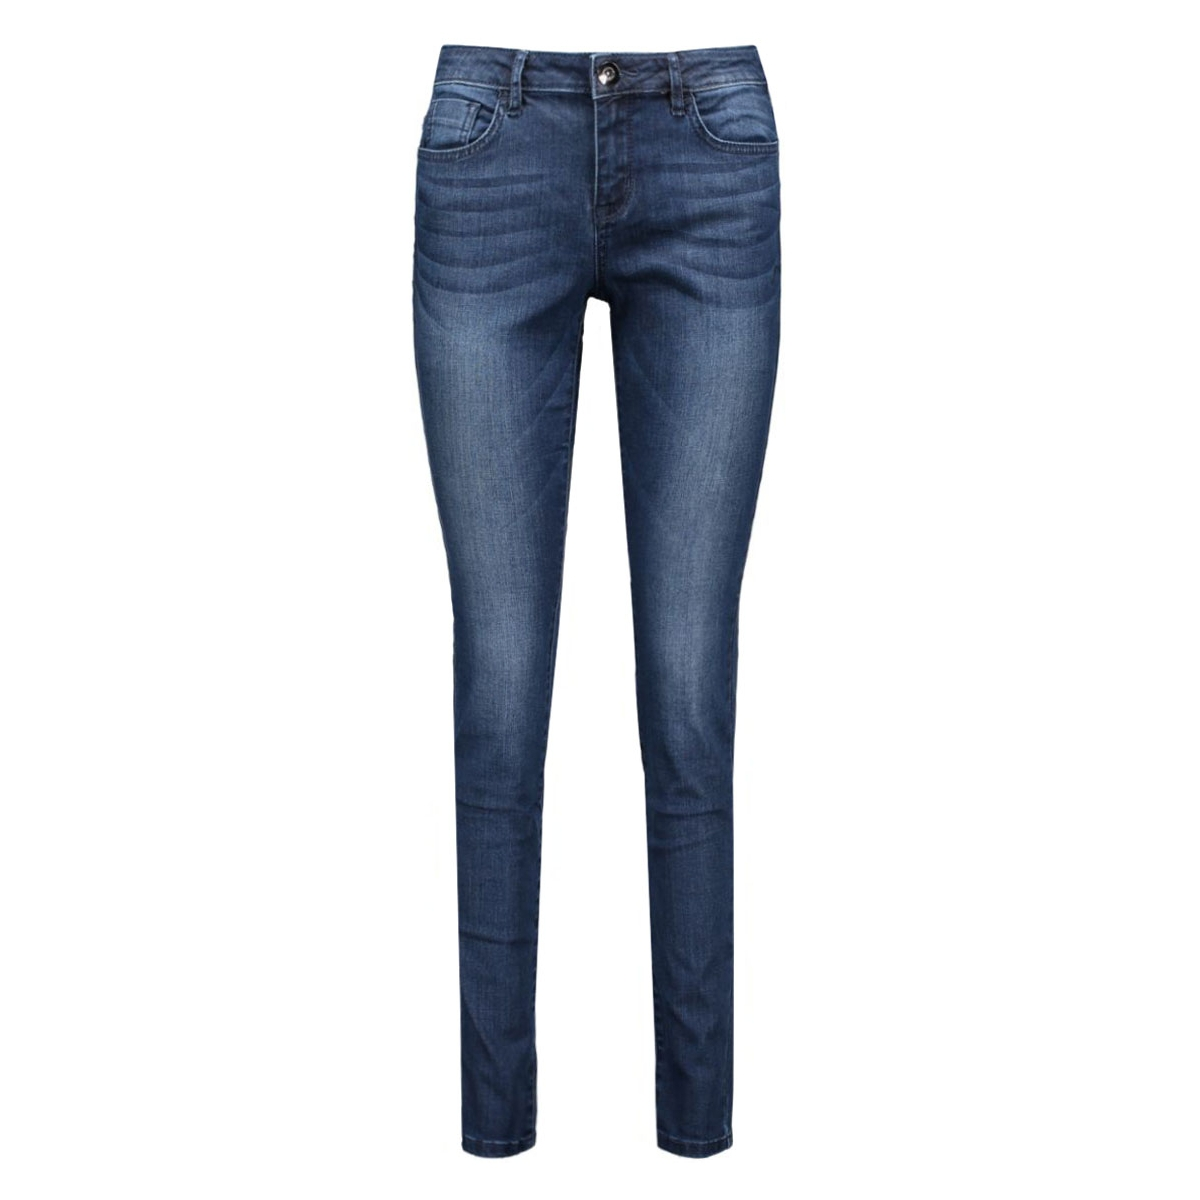 6204919.09.75 tom tailor jeans 1070